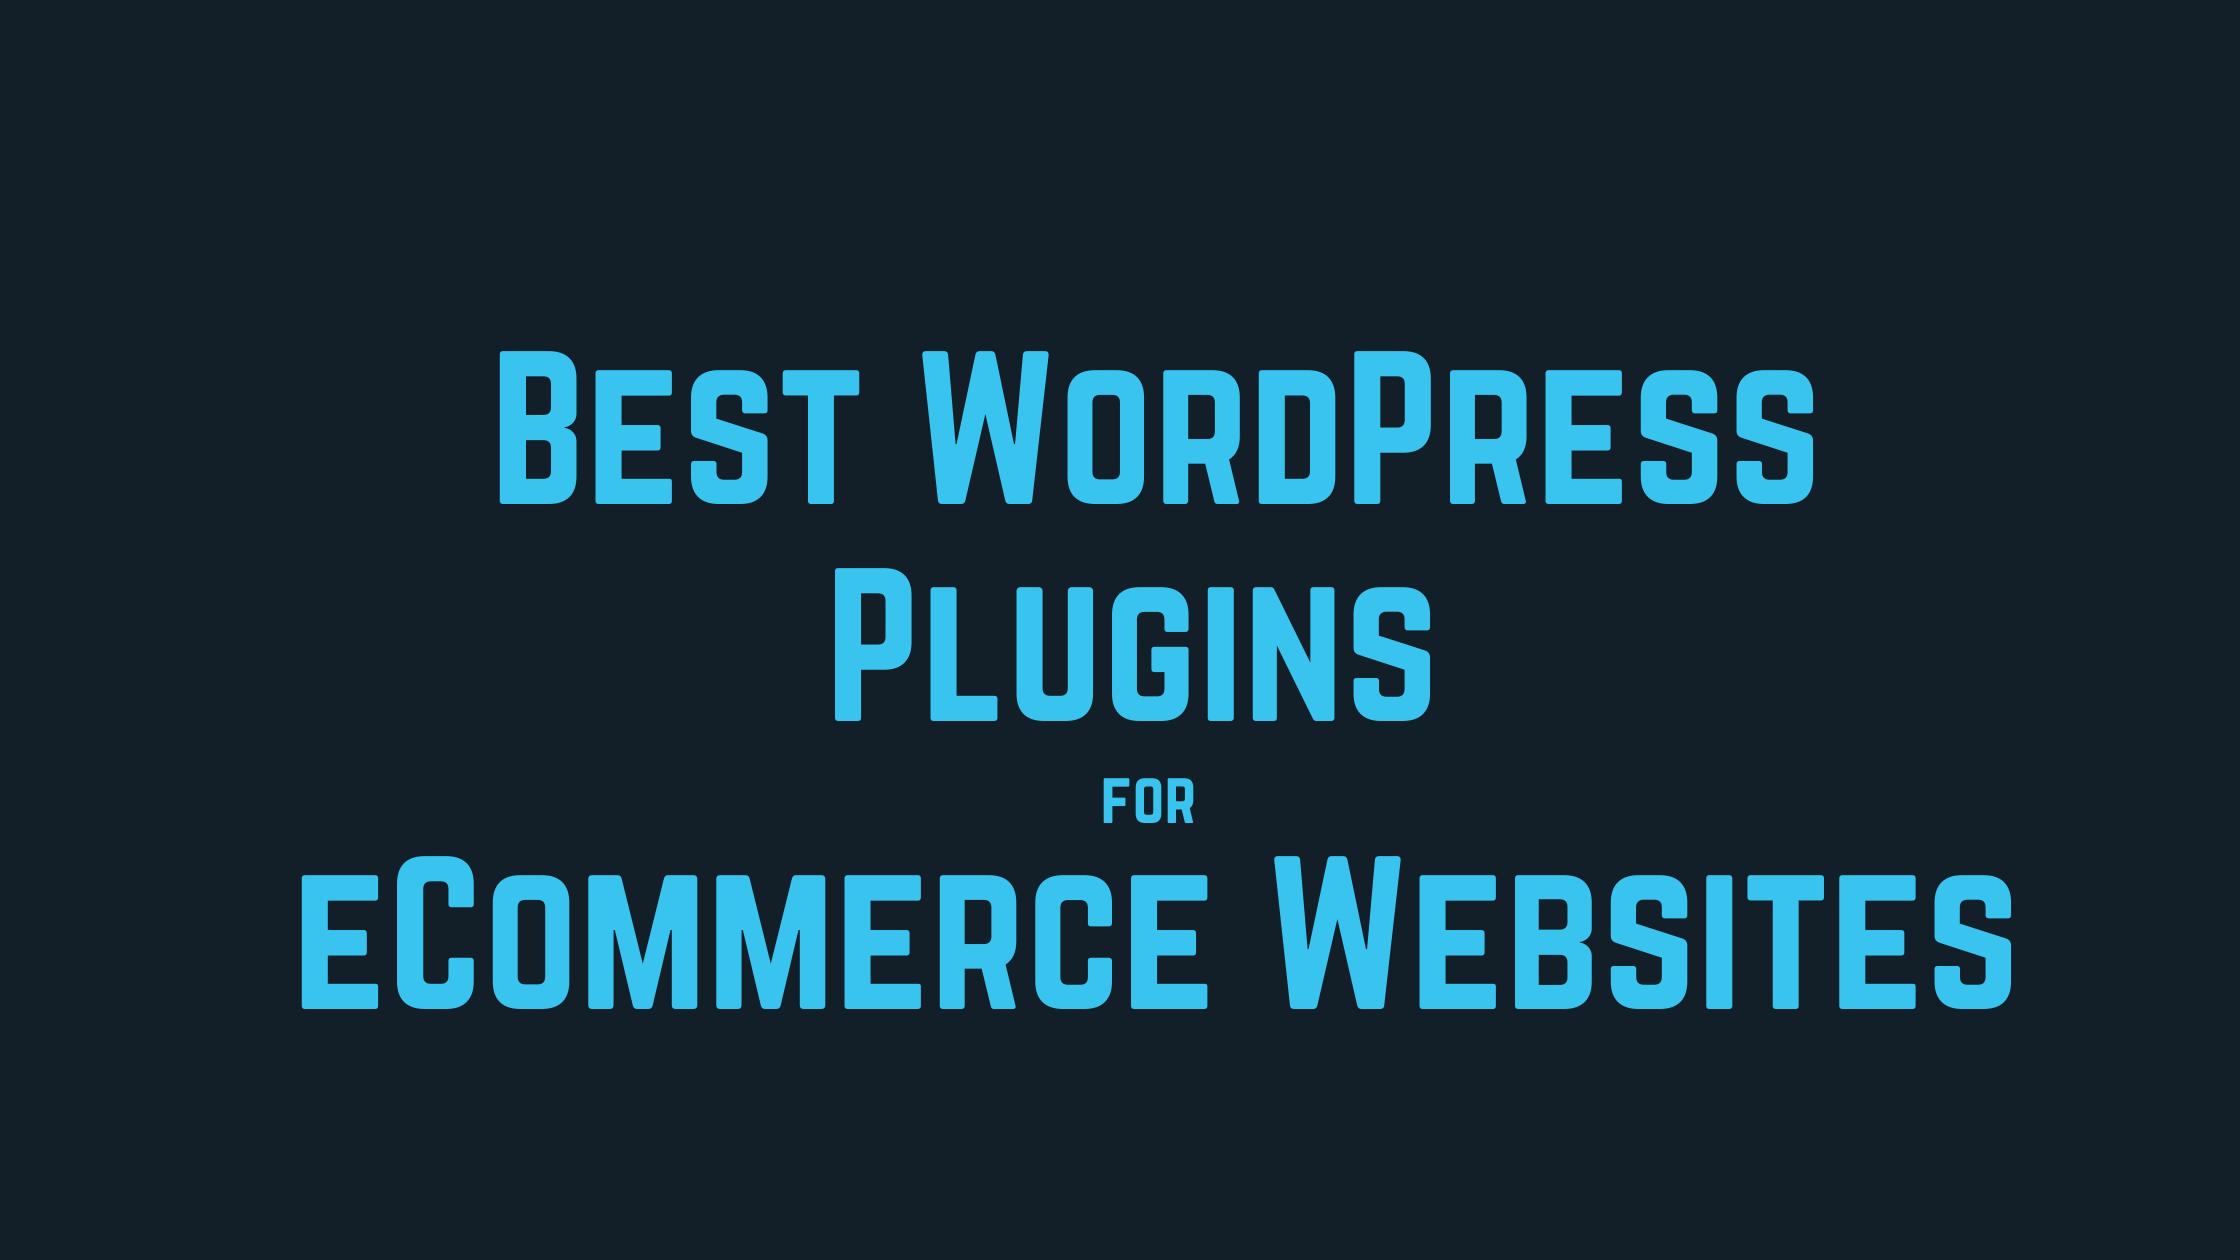 best wordpress plugins for ecommerce websites